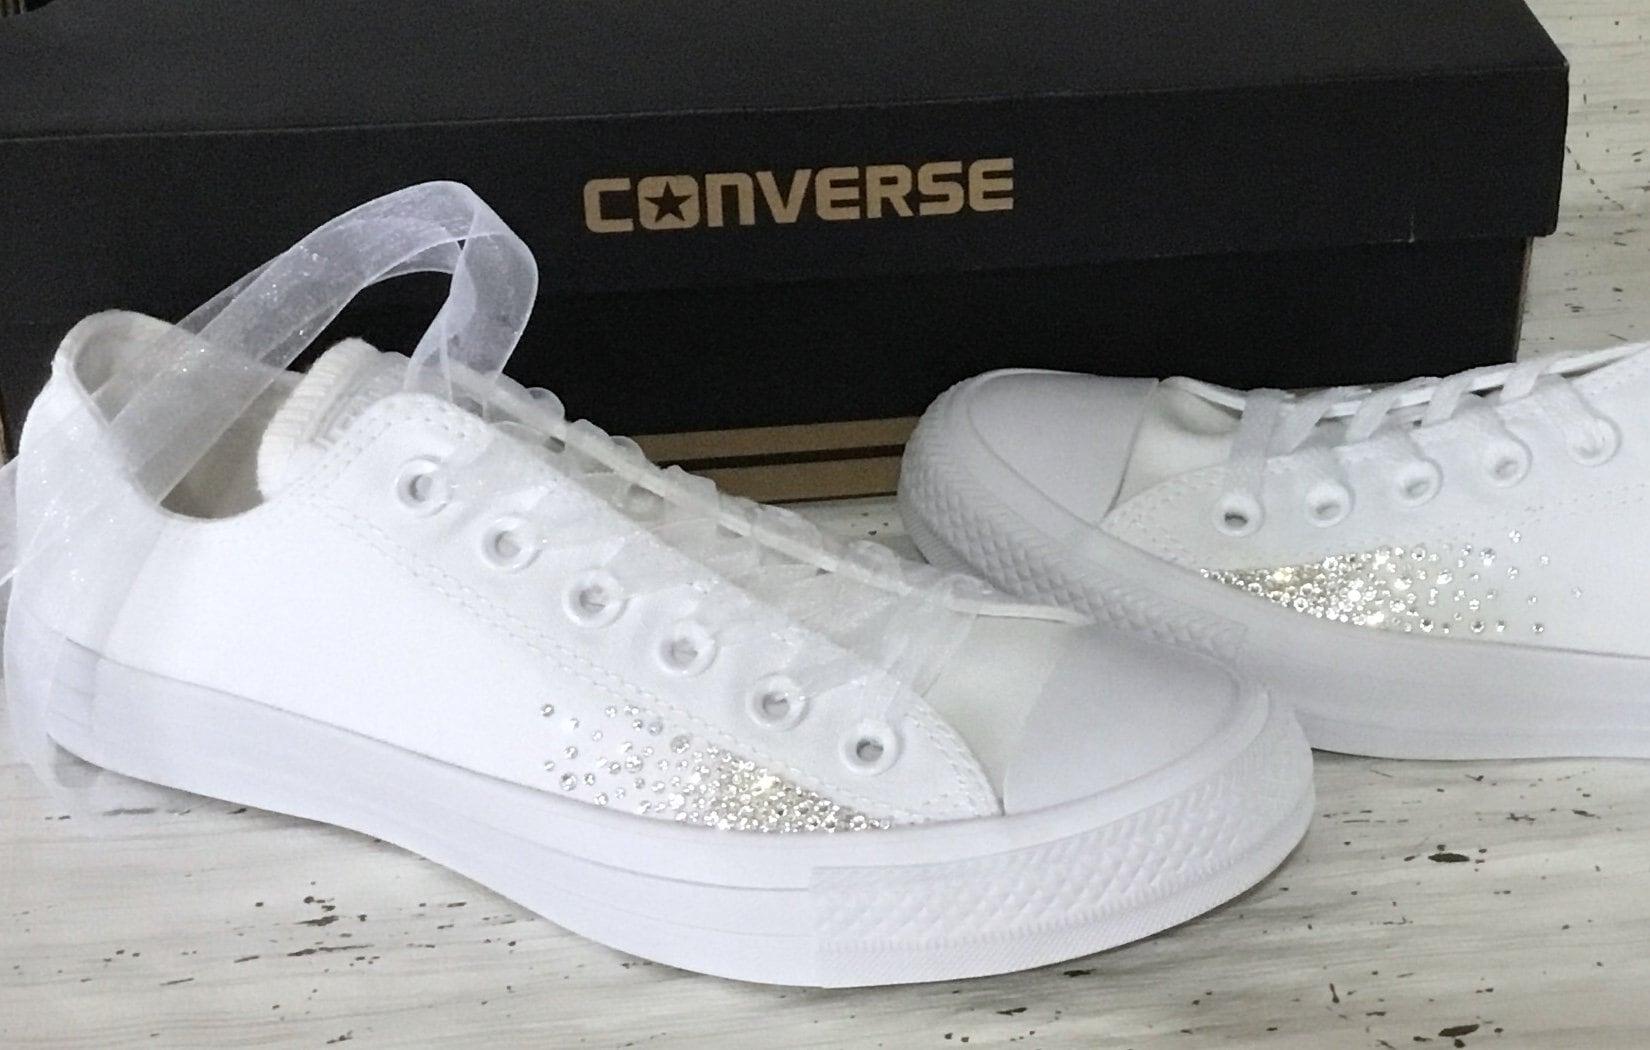 421752e3414f7 Sparkle Converse White Monochrome Canvas Low Chuck Taylor Sprinkle ...